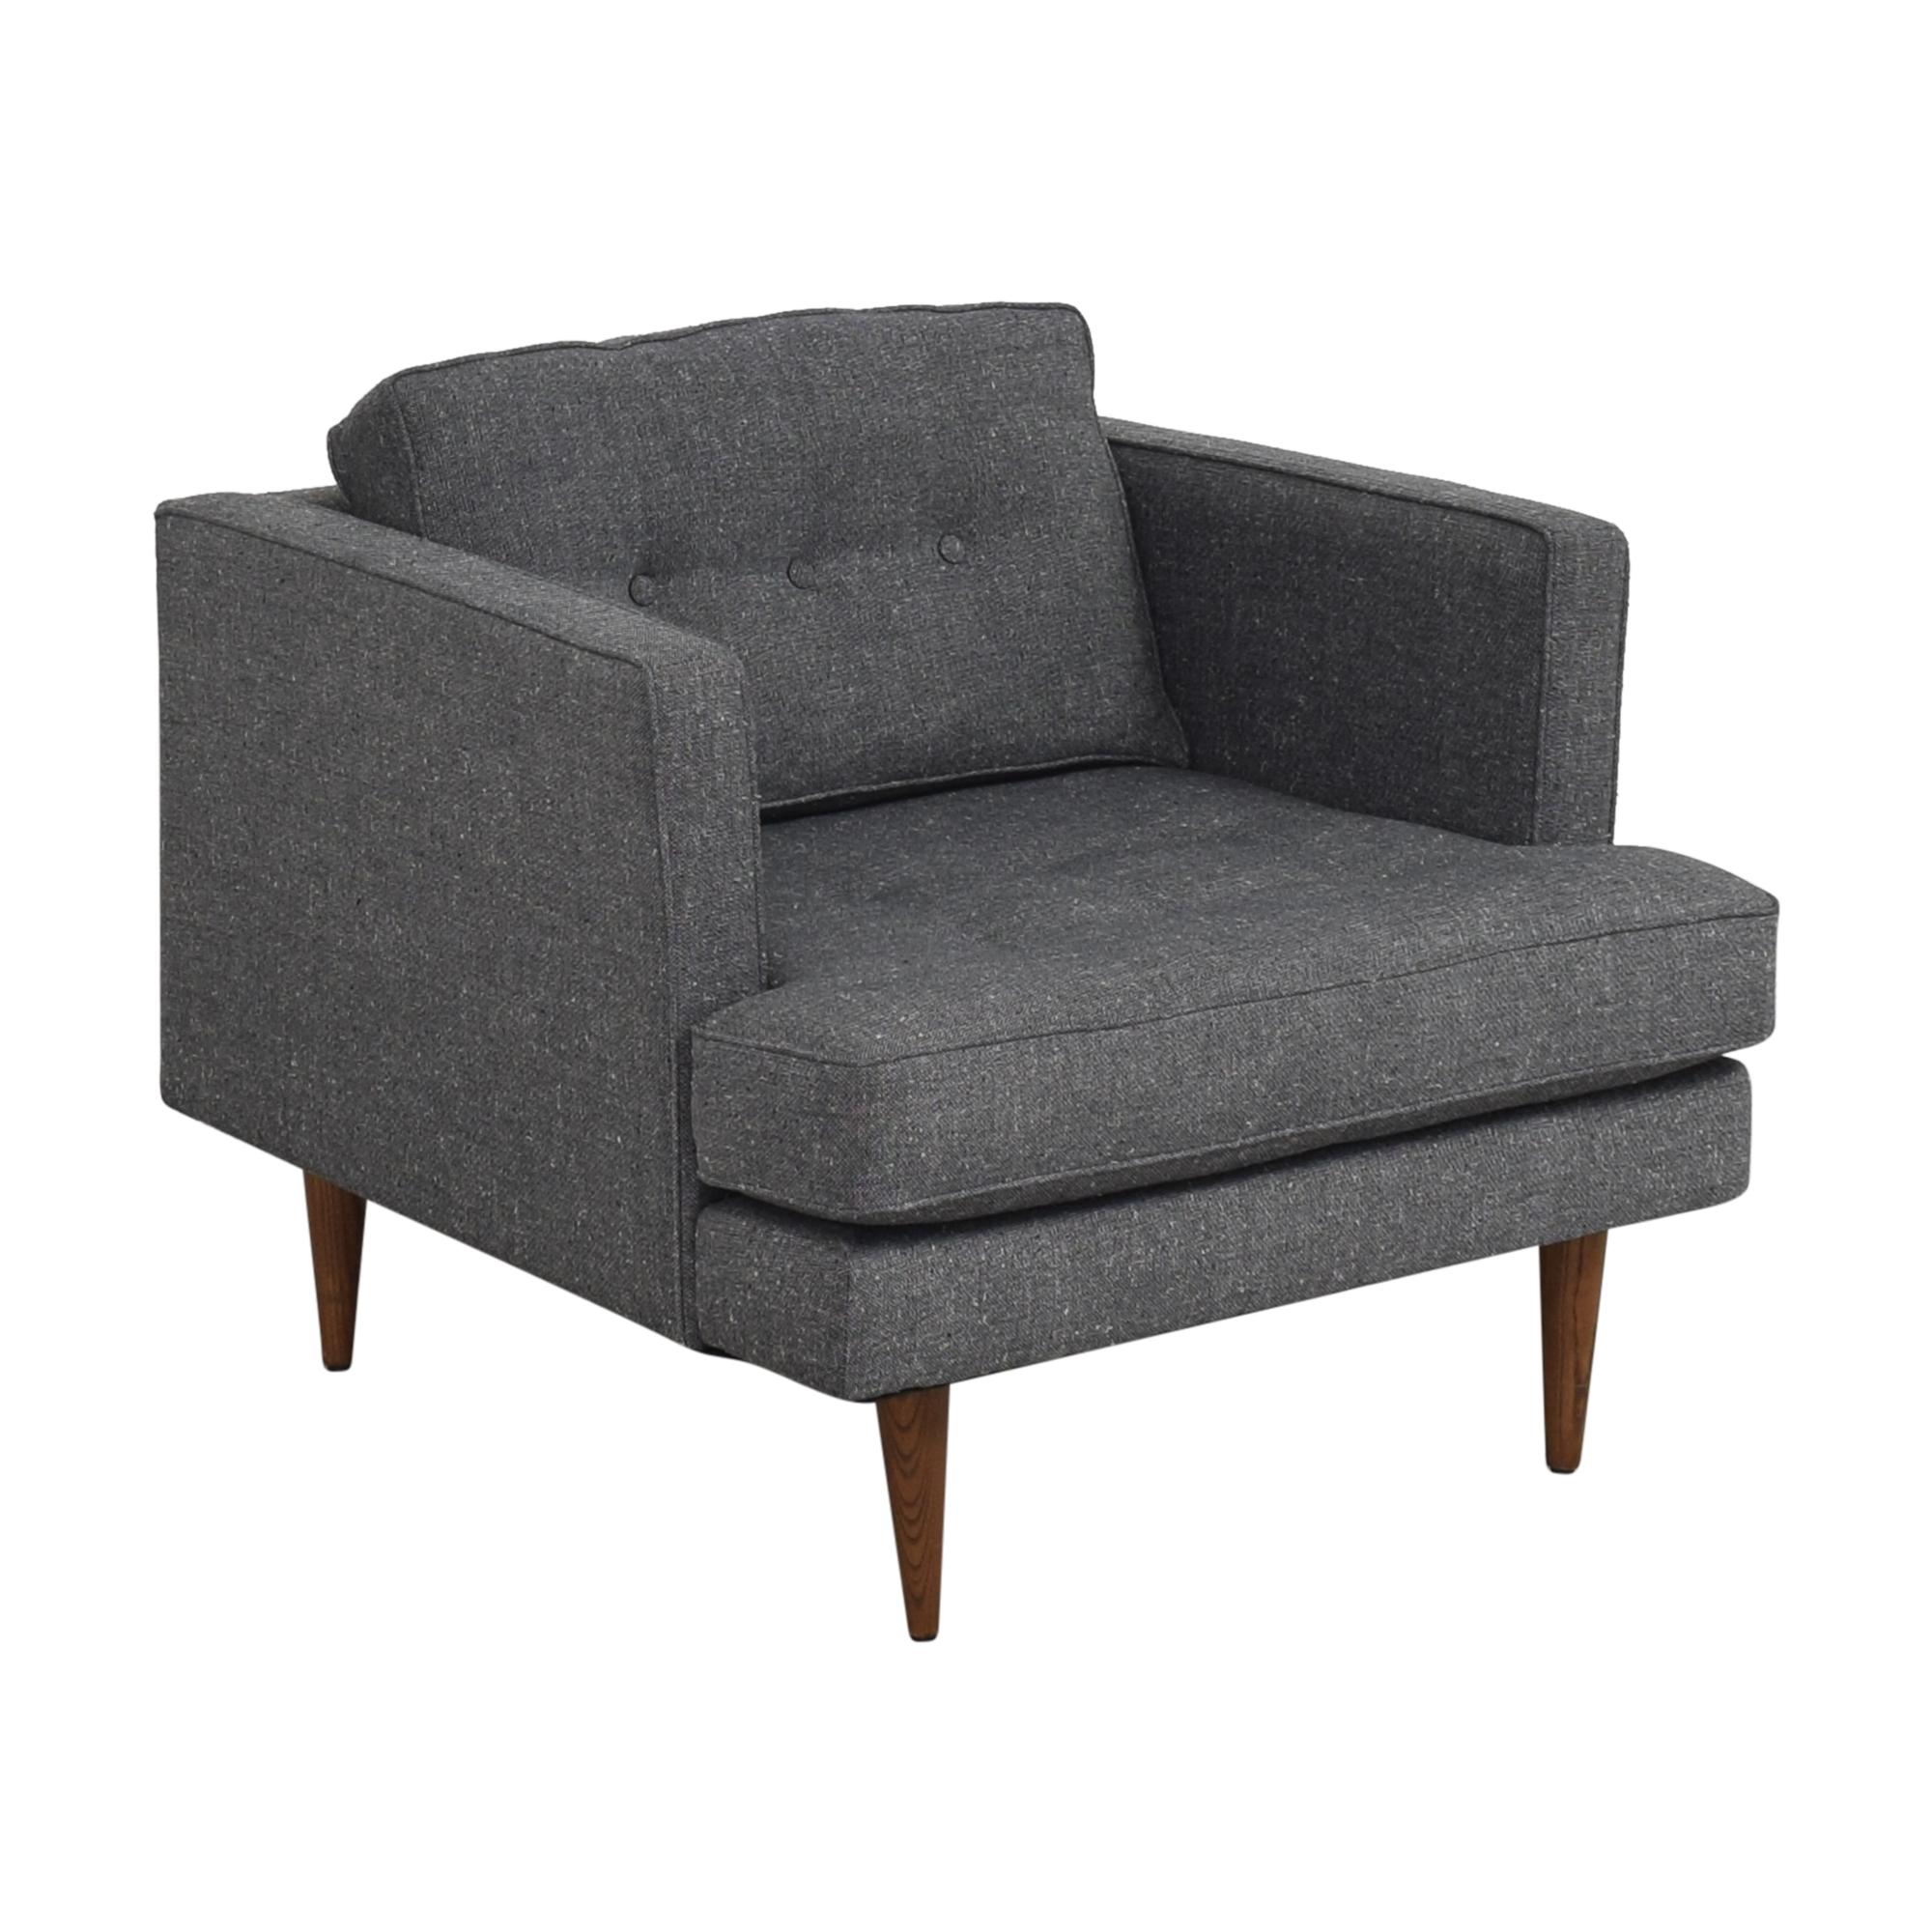 buy West Elm Peggy Mid-Century Armchair West Elm Chairs